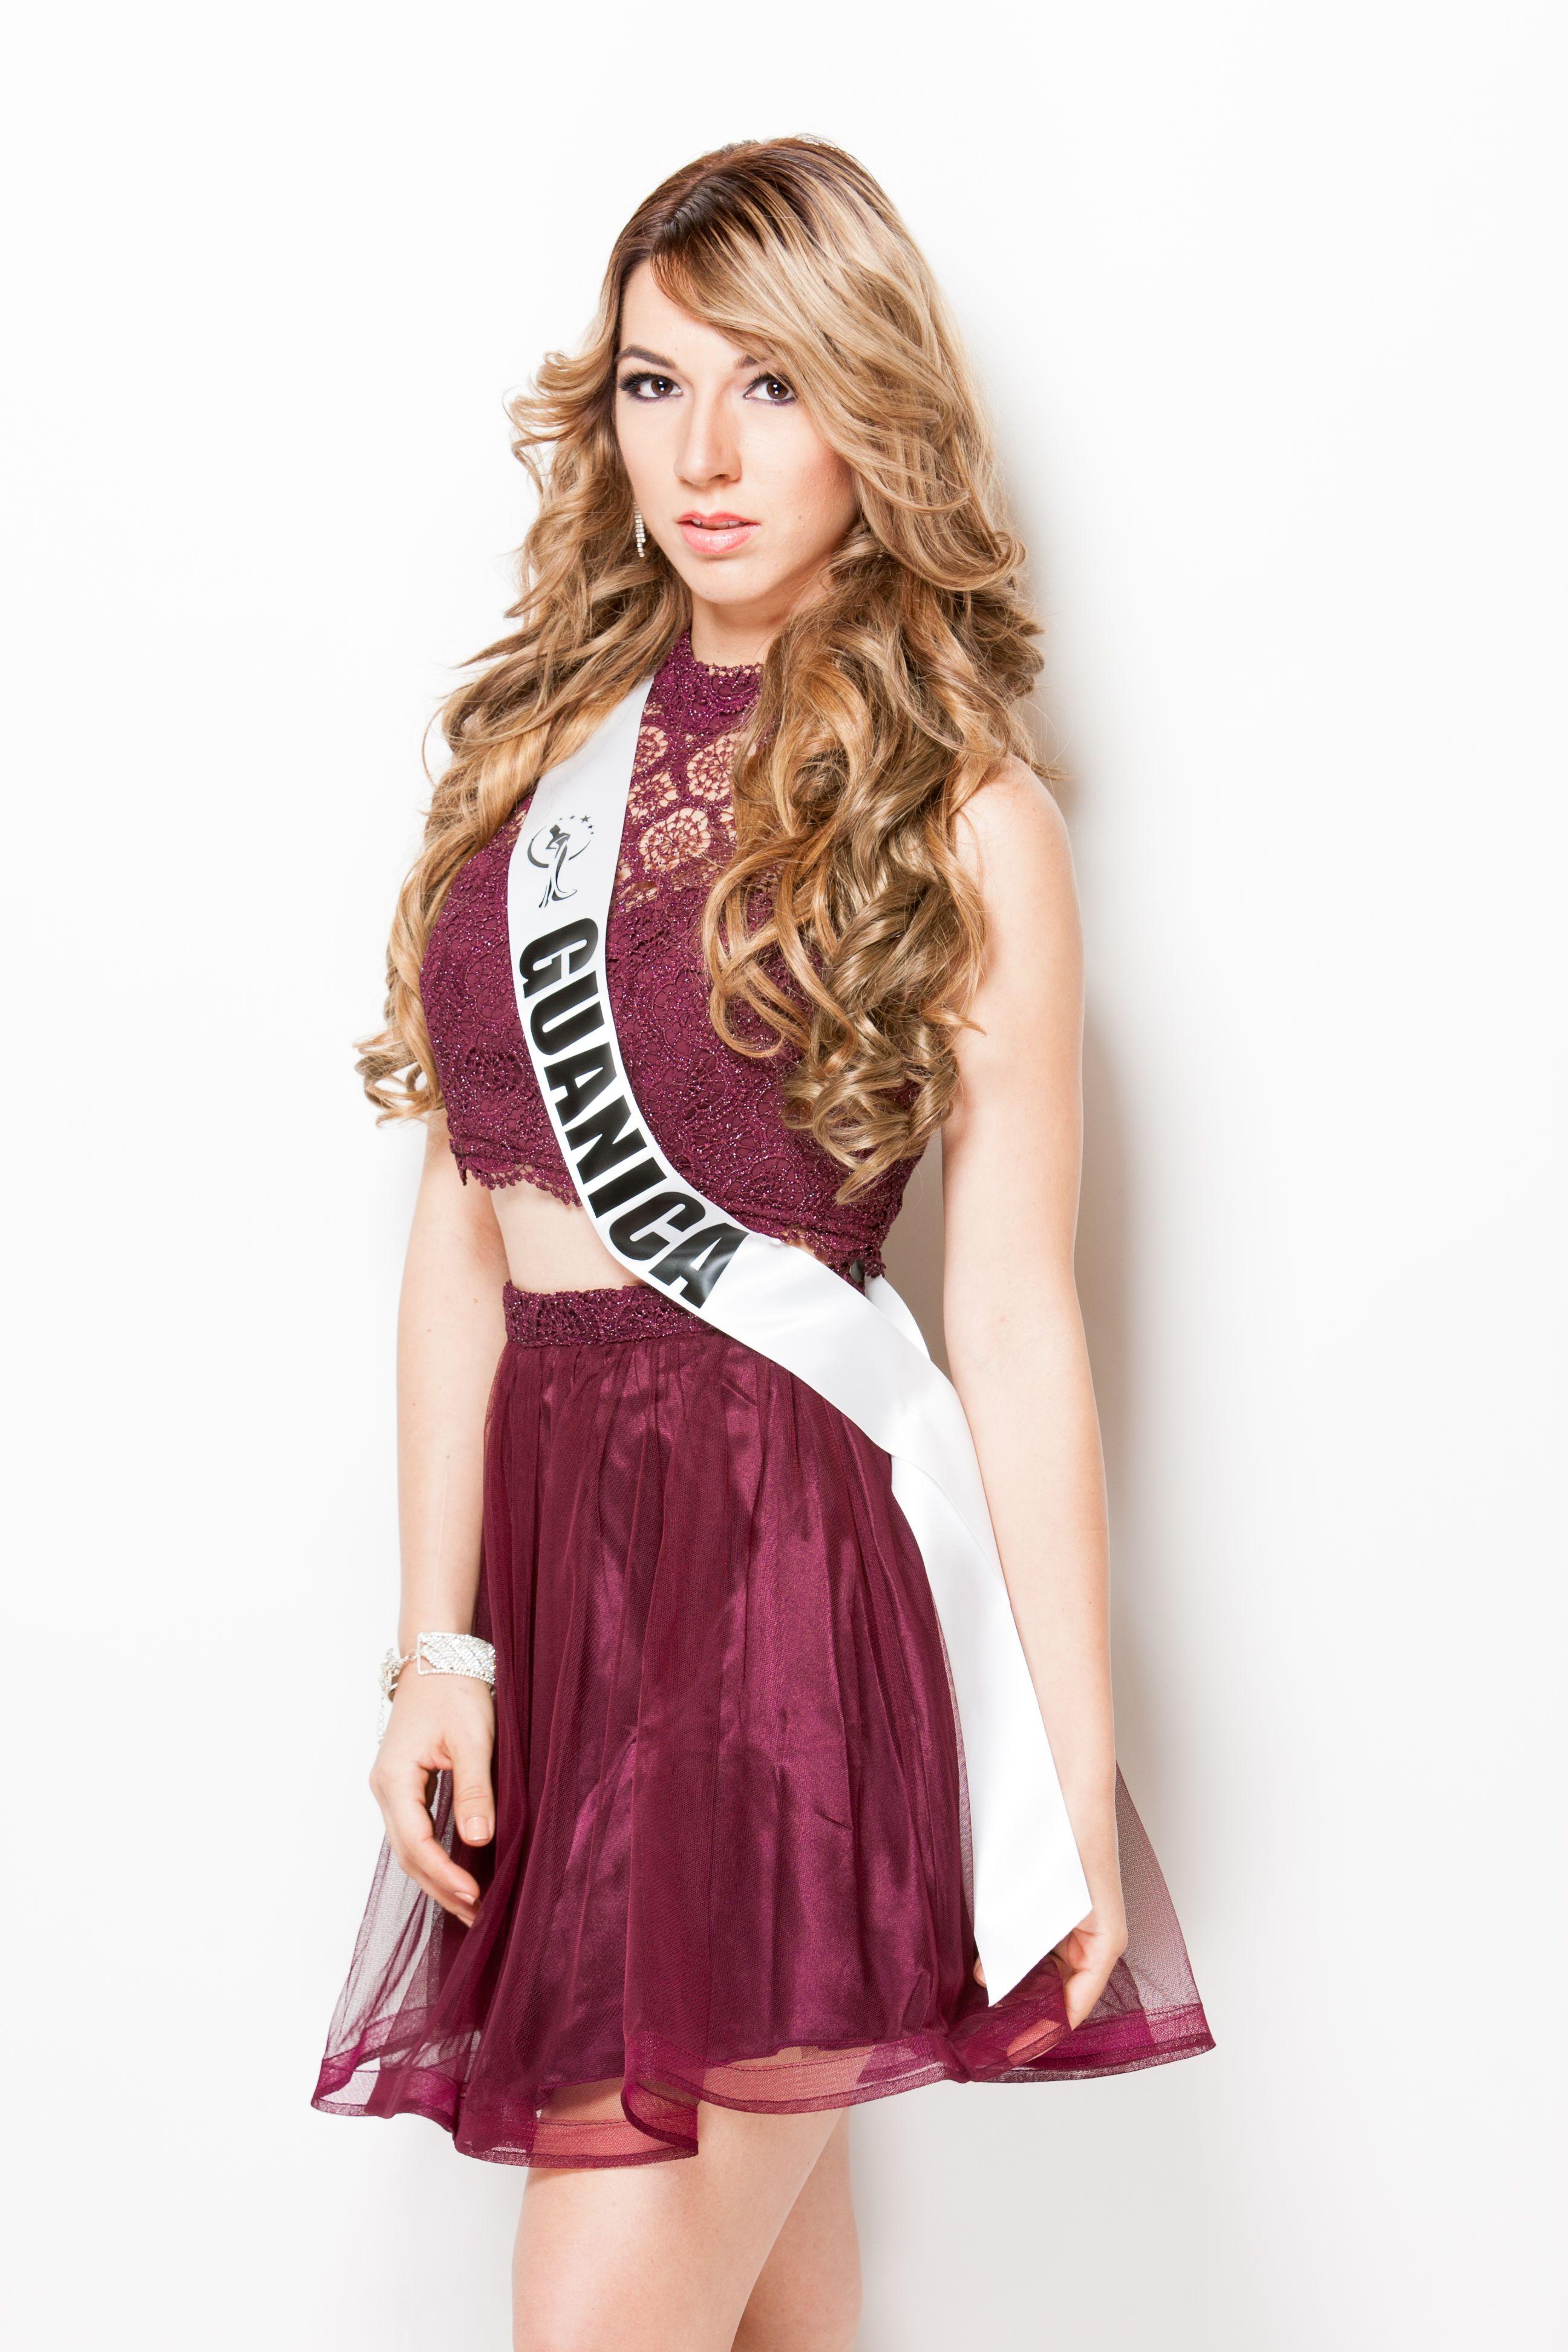 MISS PUERTO RICO 2017 | FOTOS OFICIALES :: Miss Guánica, Lilliriel Rivera Rodríguez. #MissUniversePuertoRico2017 #MissGuanica #LillirielRiveraRodriguez #LillirielRivera #MissPuertoRico2017 #MissGuanica2017 #MissUniversePuertoRico #MUPR